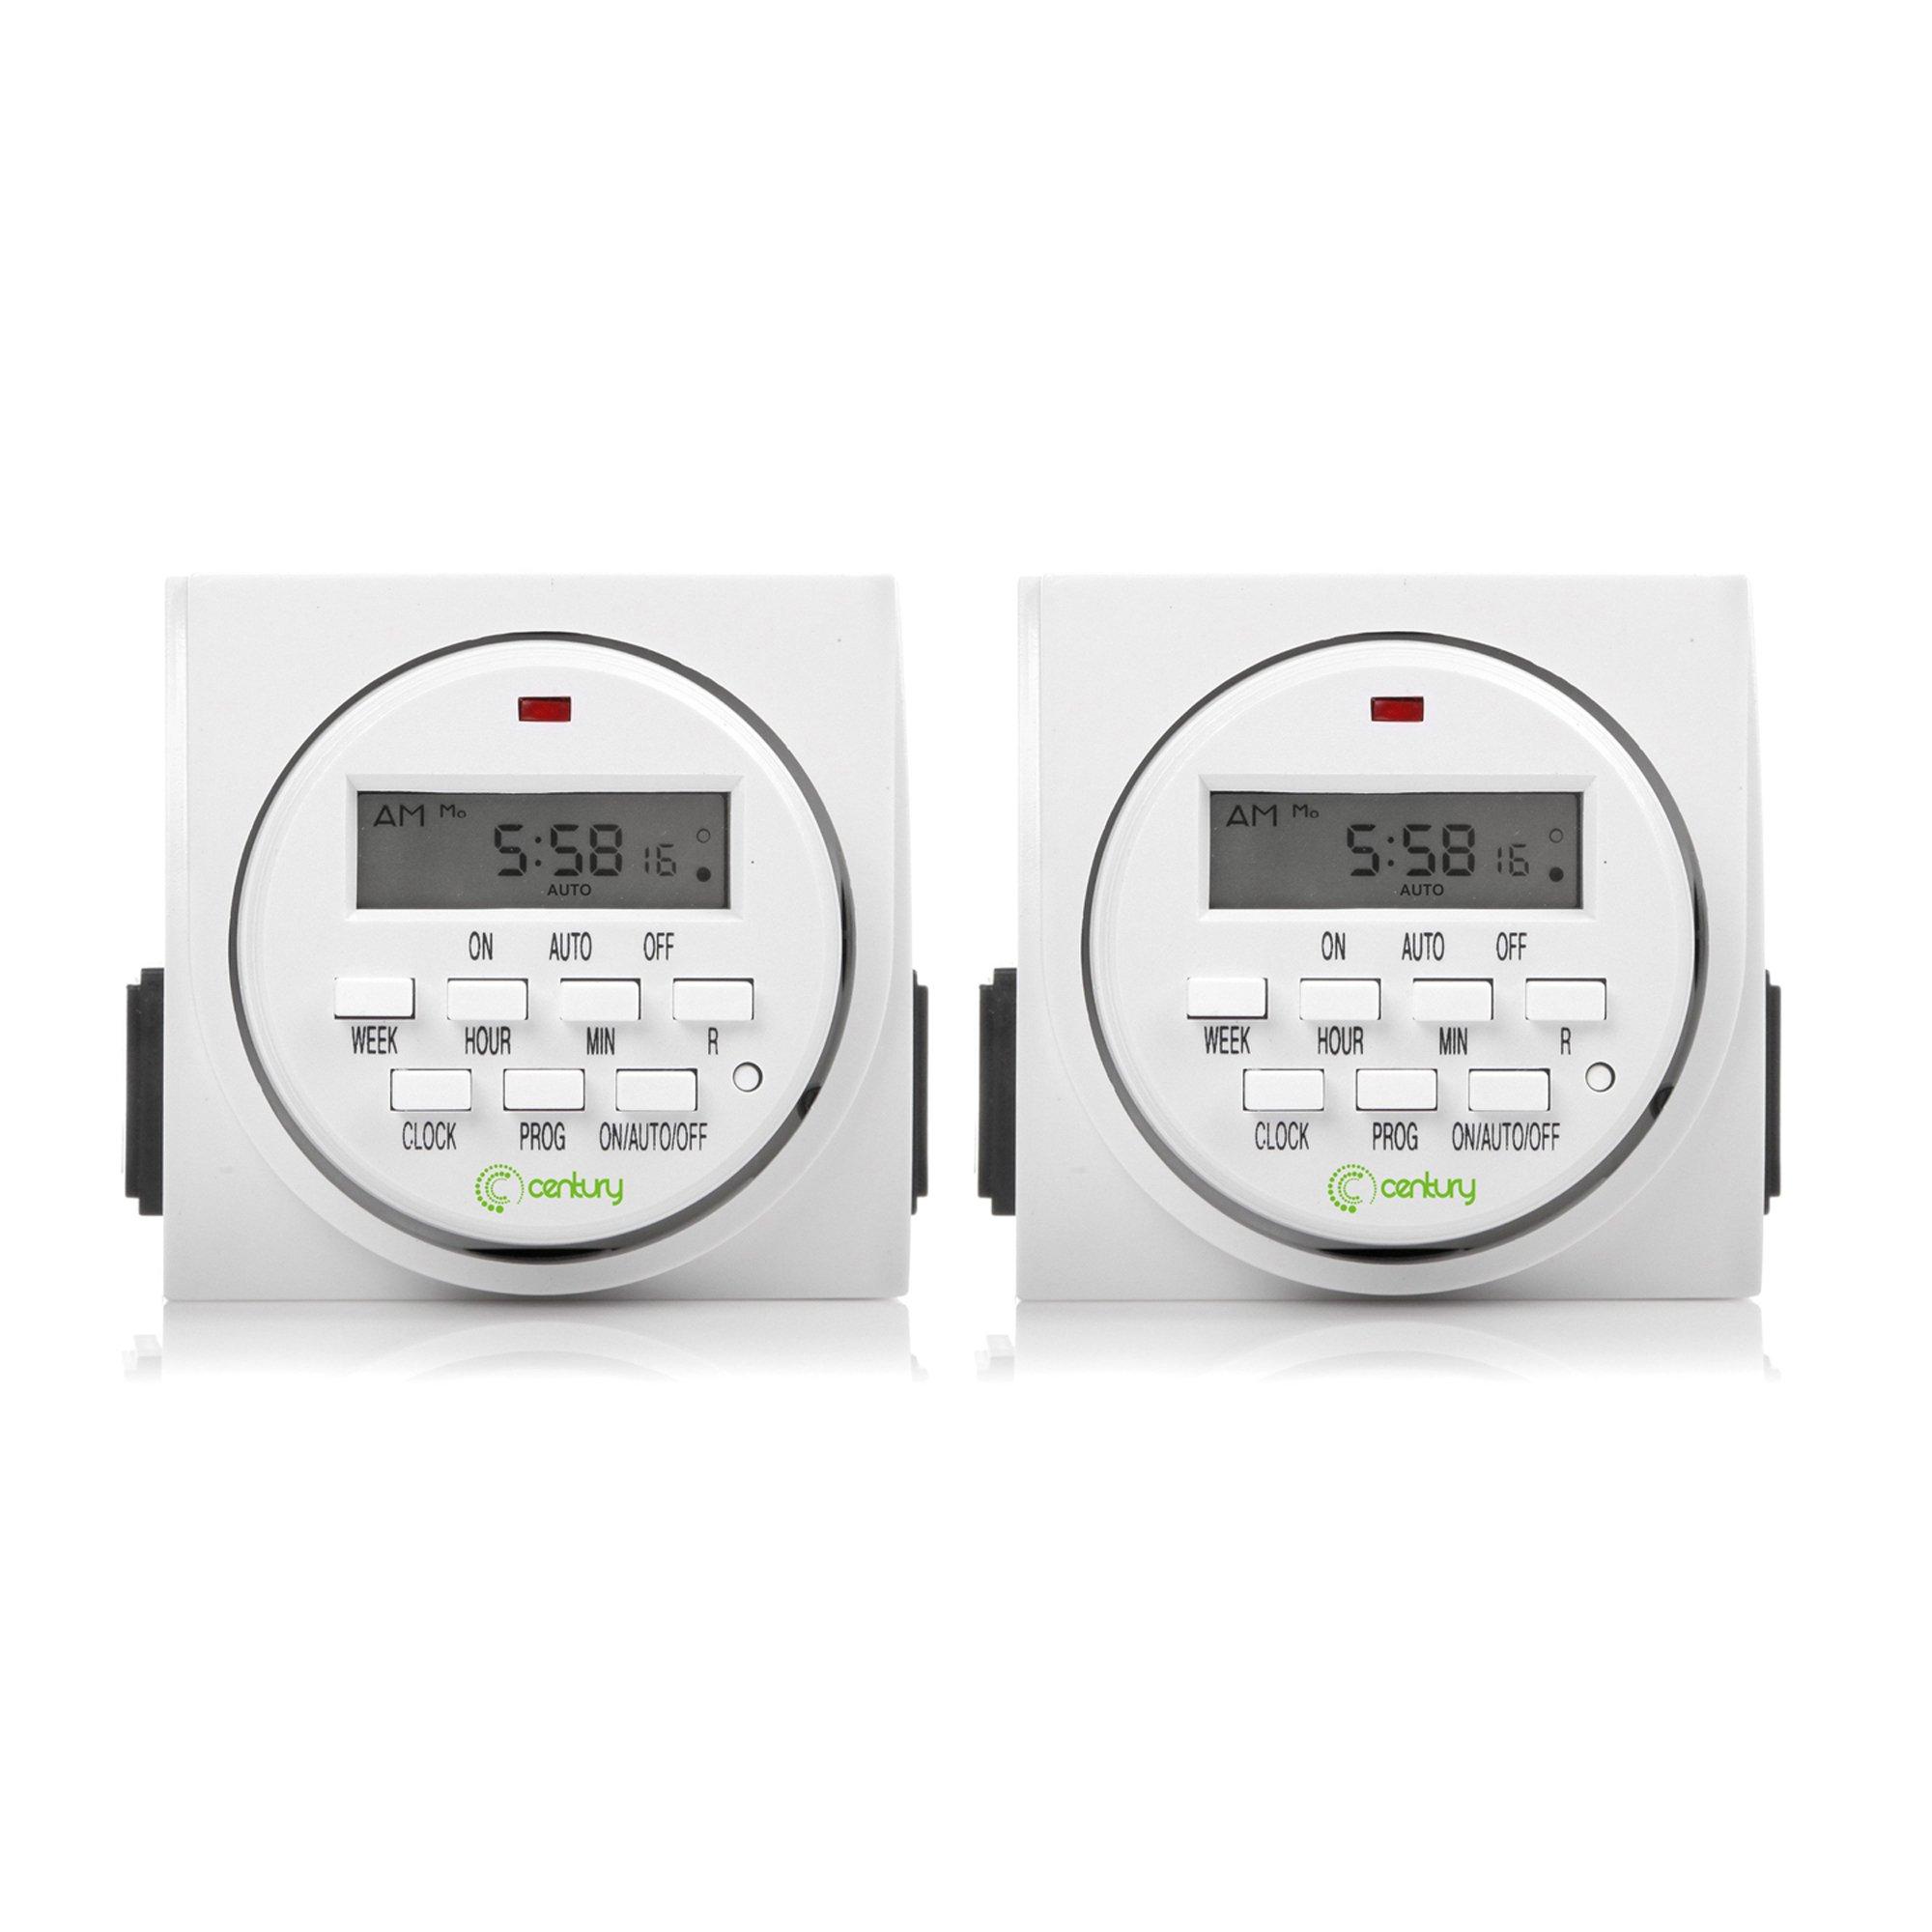 Century 2 Pack FD60-U6 Indoor Digital Timer, White